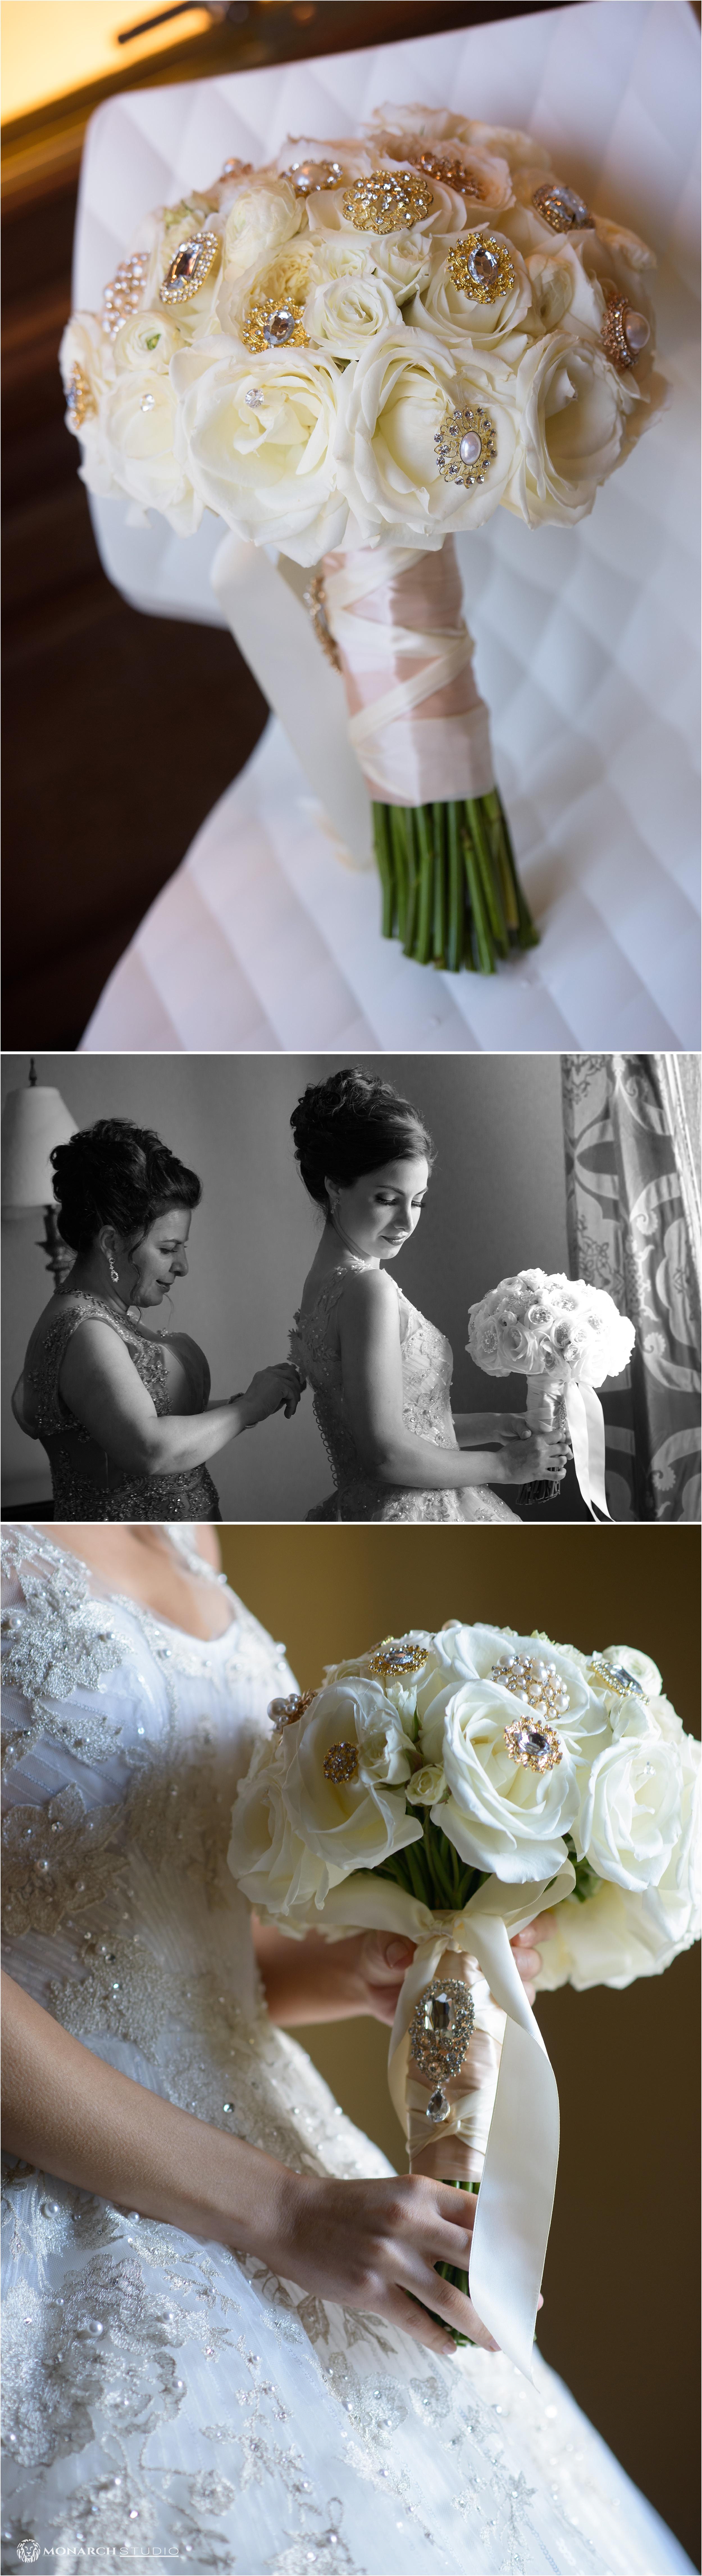 Persian-Aghd-Wedding-Photographer- سفره عقد-009.jpg